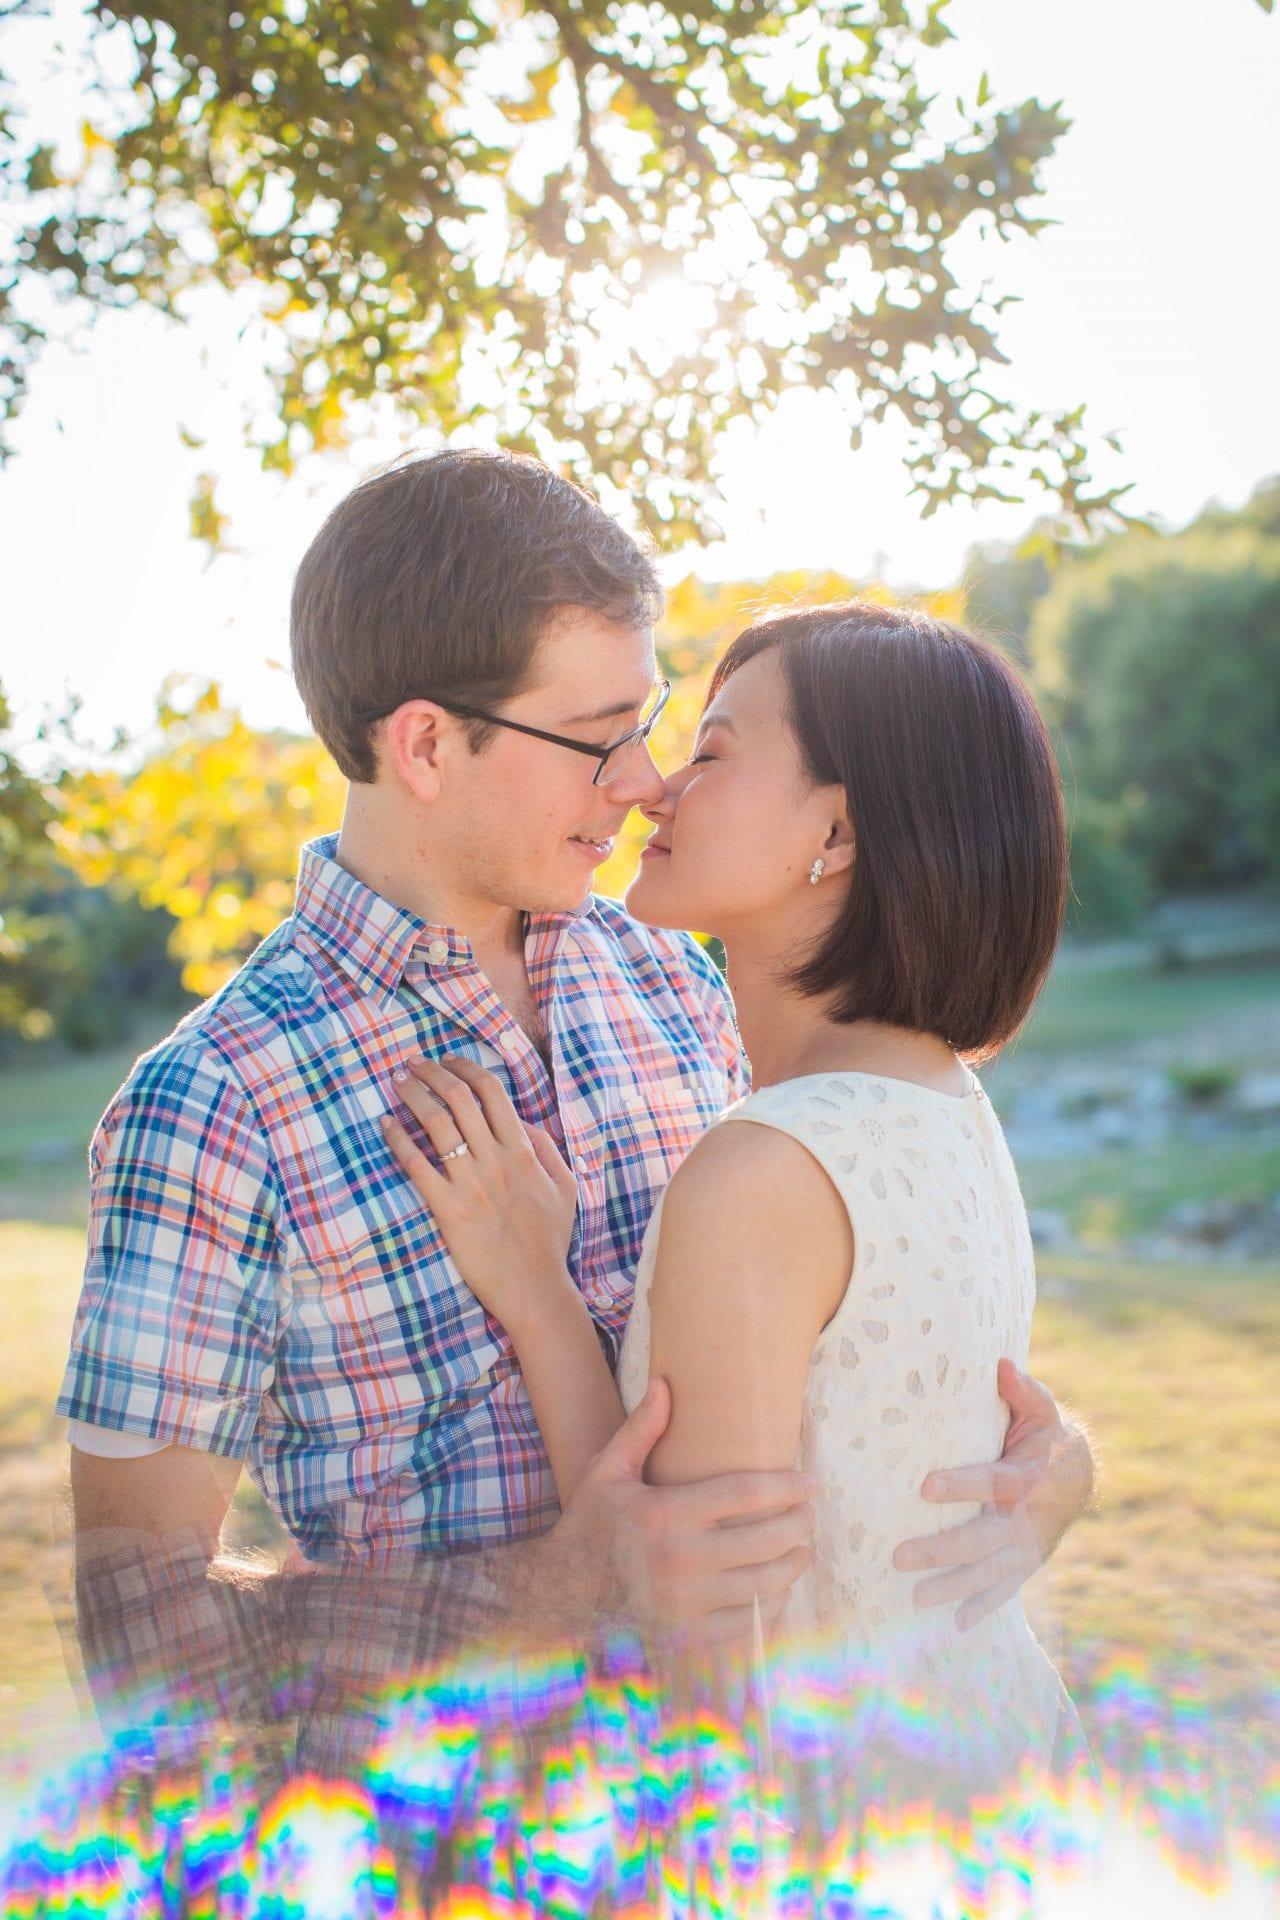 Josh and Tina engagement session at Kendall plantation under tree